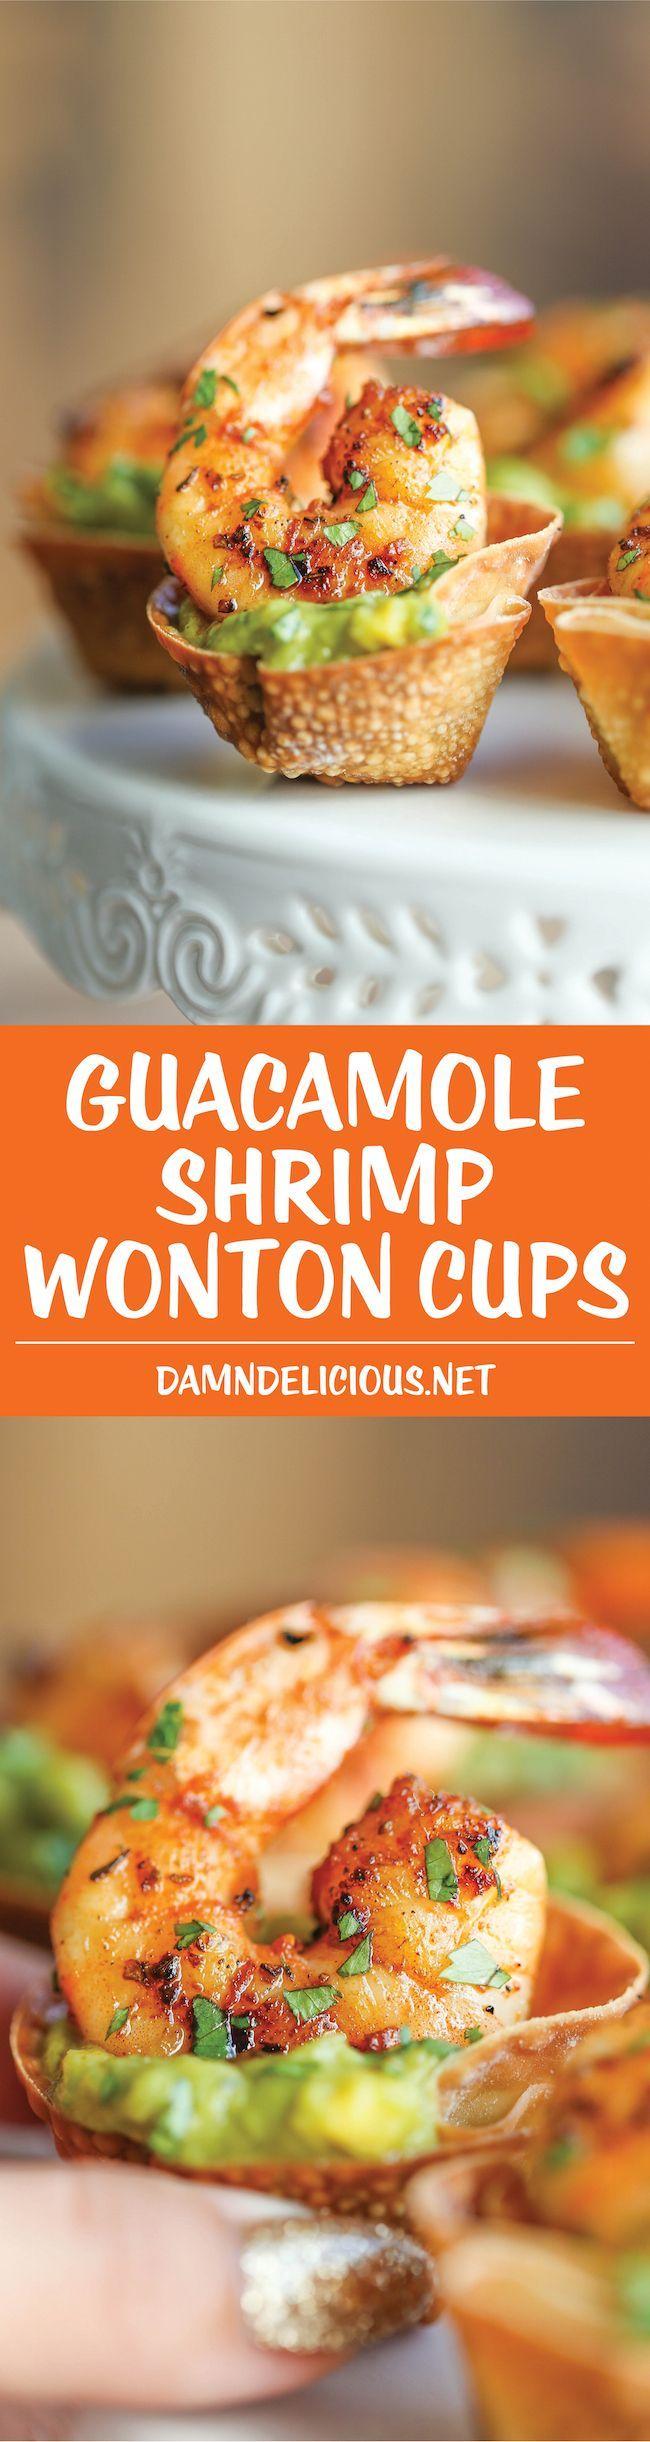 Guacamole Shrimp Wonton Cups - Crisp wonton cups filled with guacamole ...